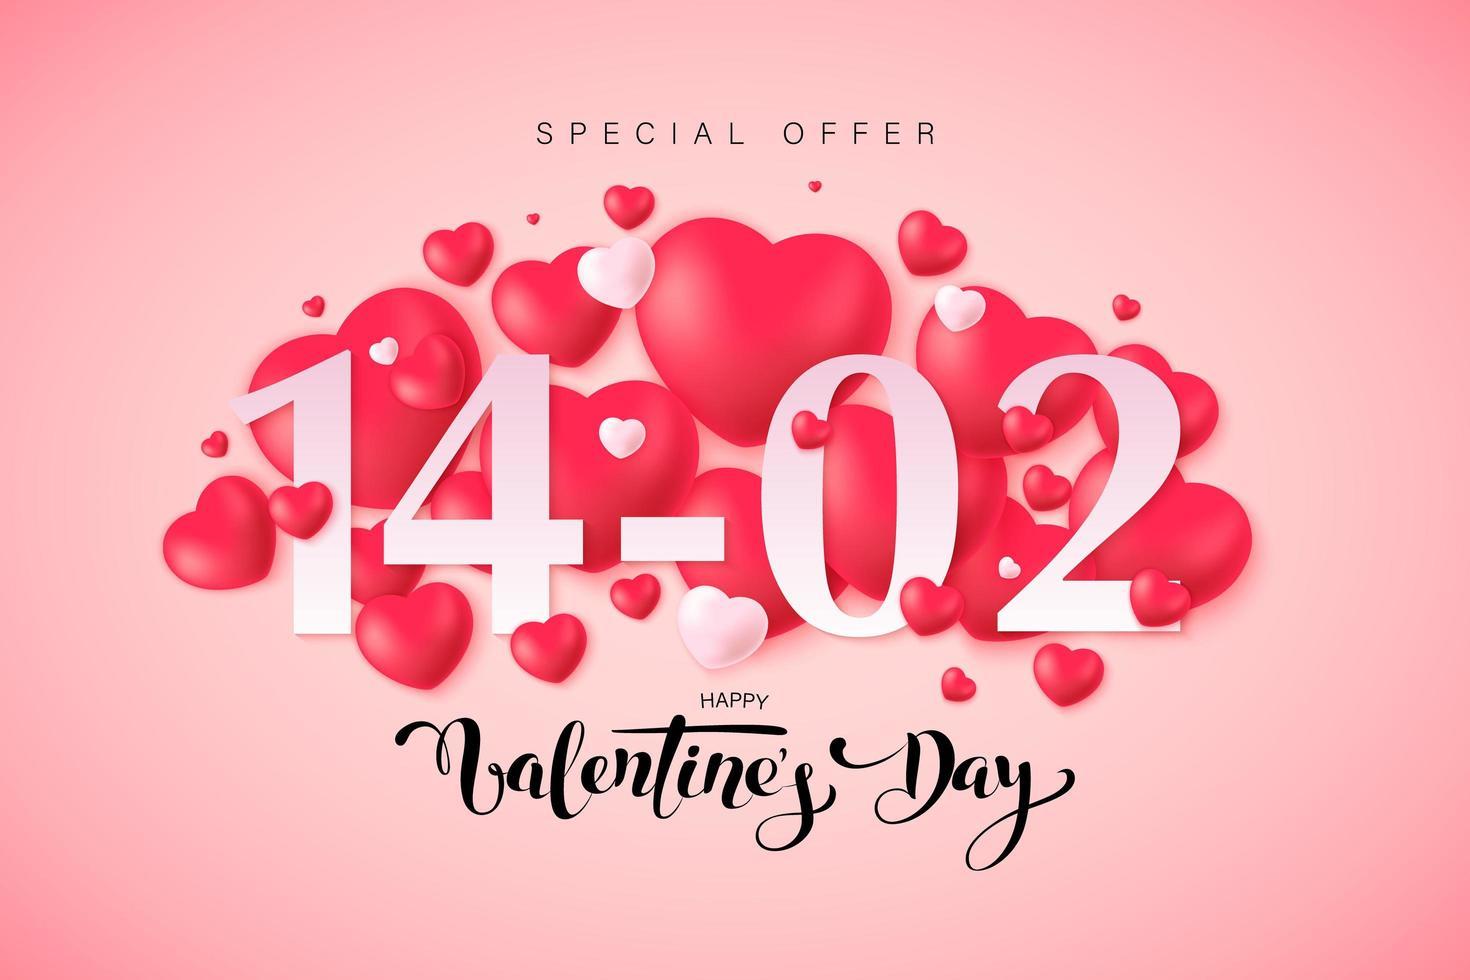 Happy Valentine's Day greeting card design vector